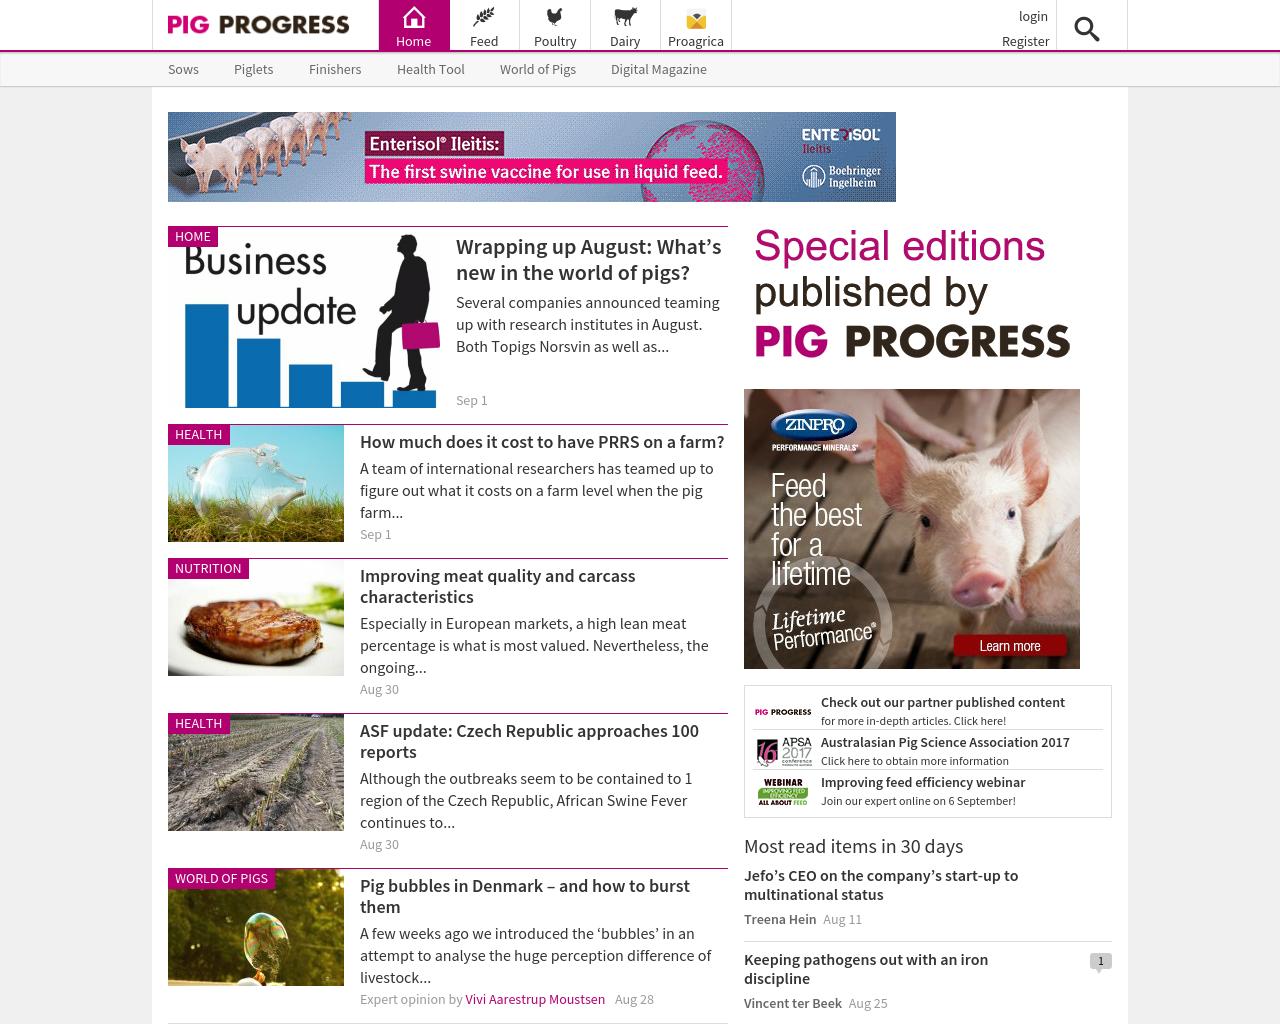 Pig-Progress-Advertising-Reviews-Pricing